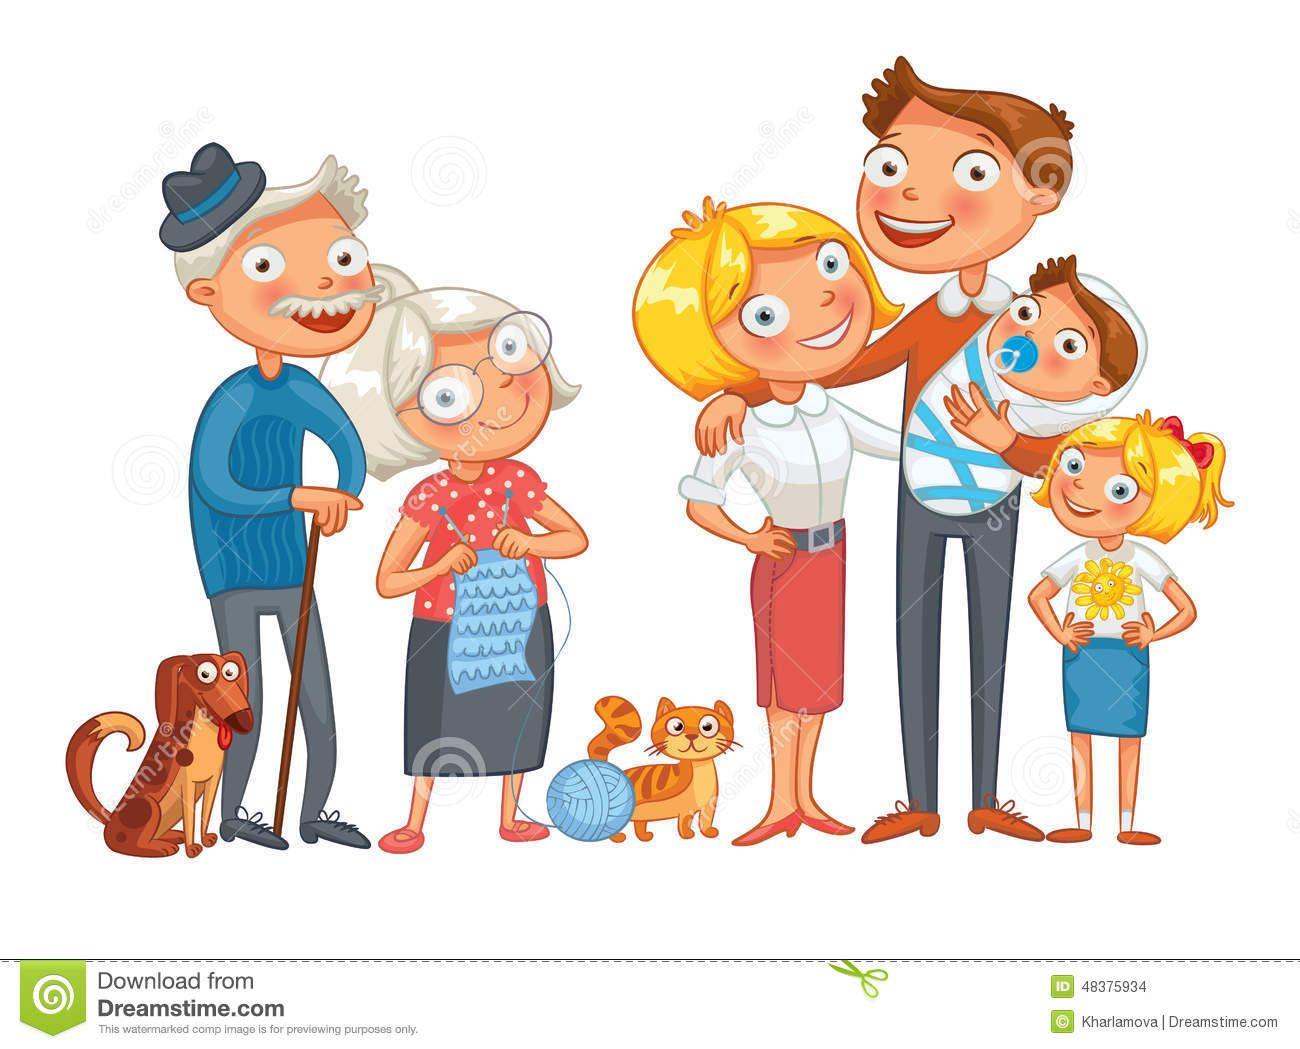 bighappyfamilyconsistingfathermotherdaughterson